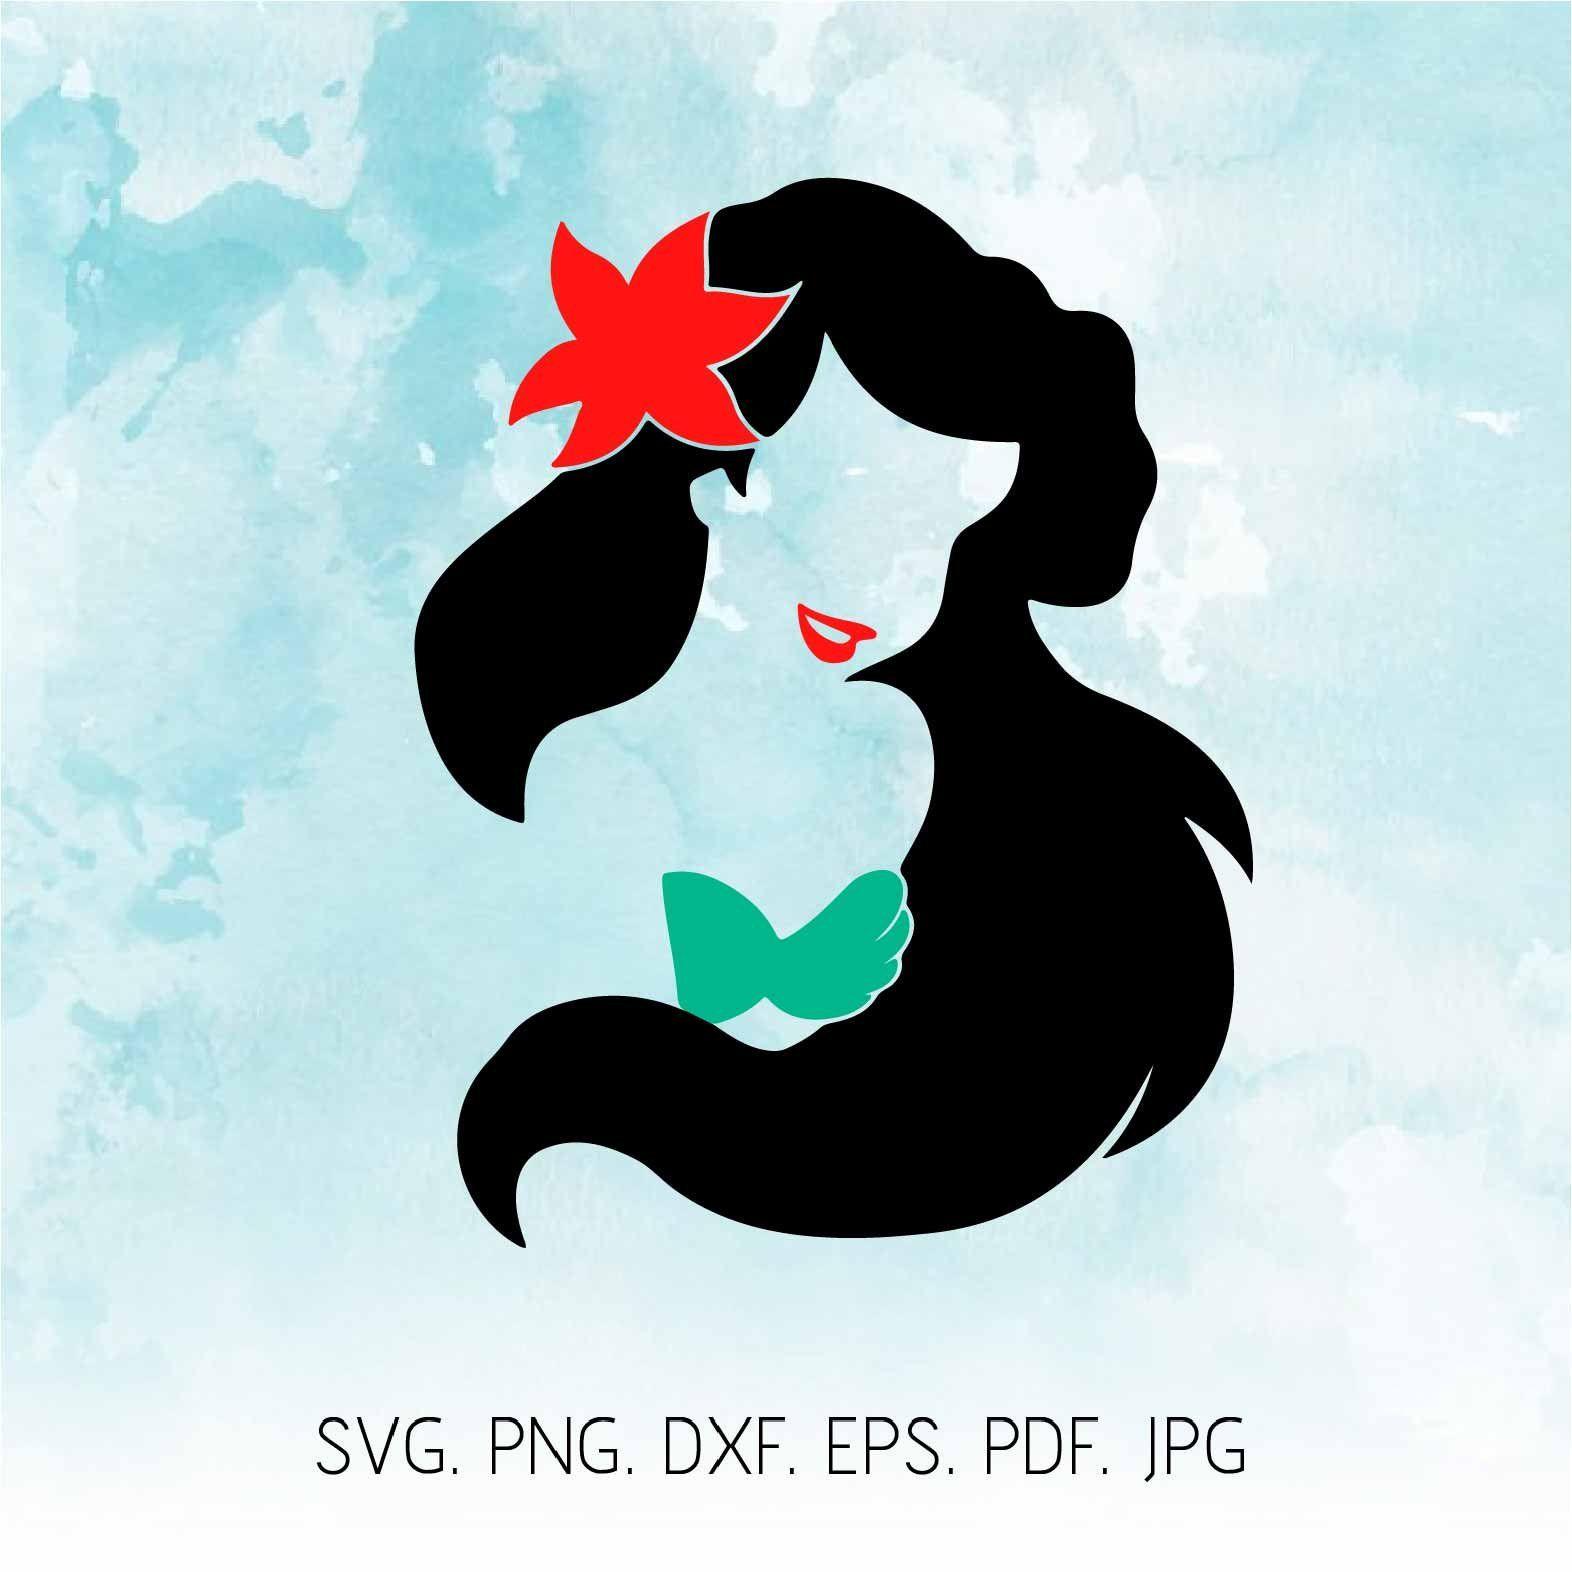 Little Mermaid Svg, Ariel Svg, Disney Svg, Ariel Clipart, Mermaid.